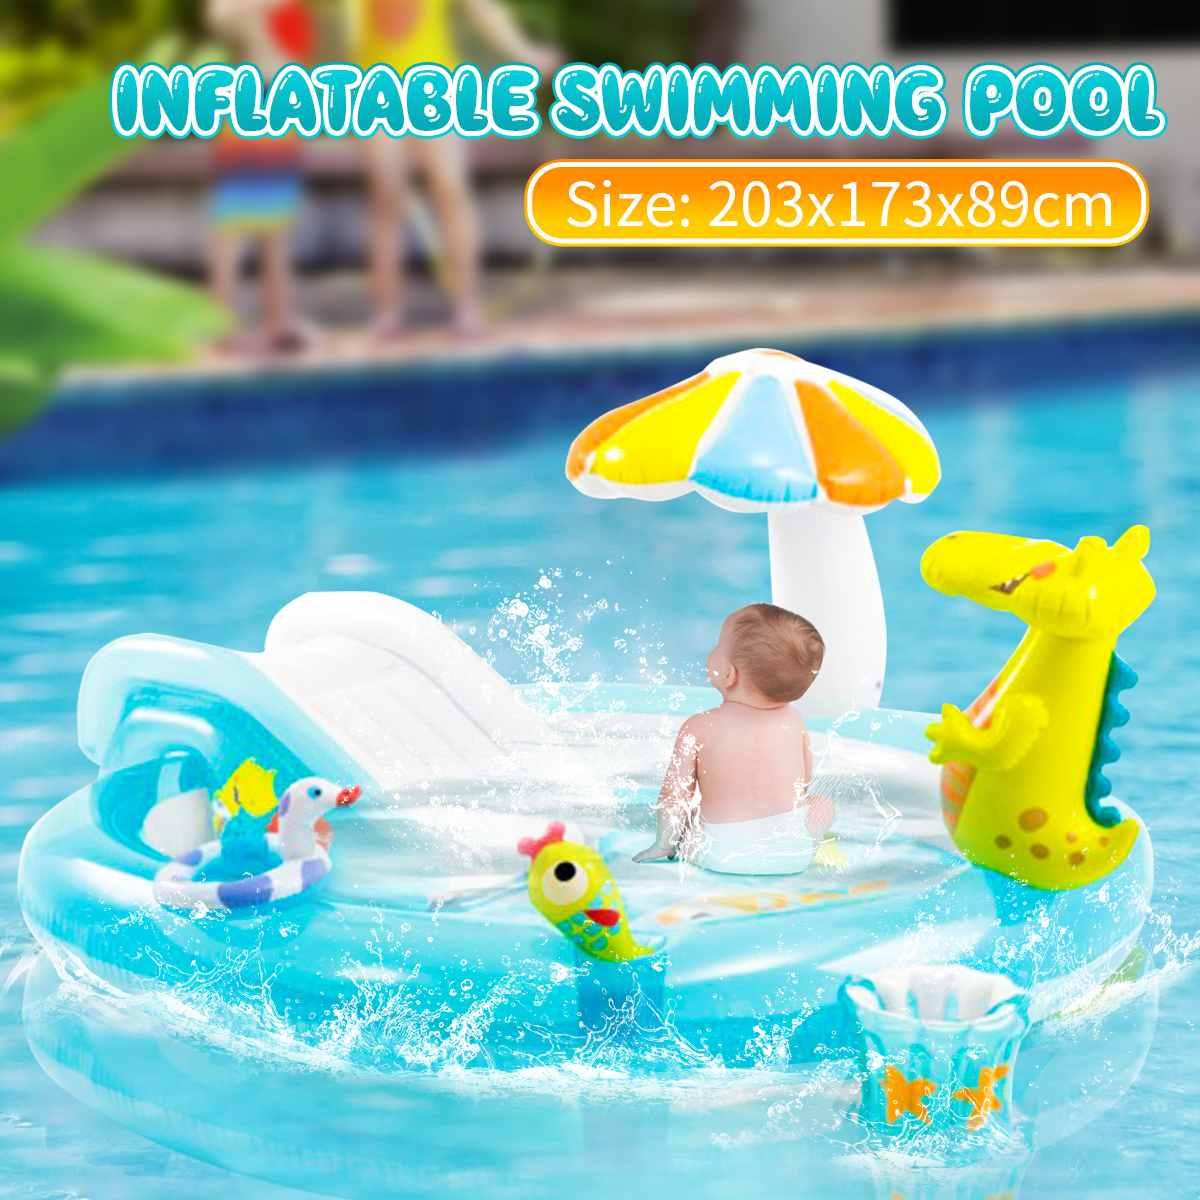 Piscina inflable para bebés, flotador, colconetas